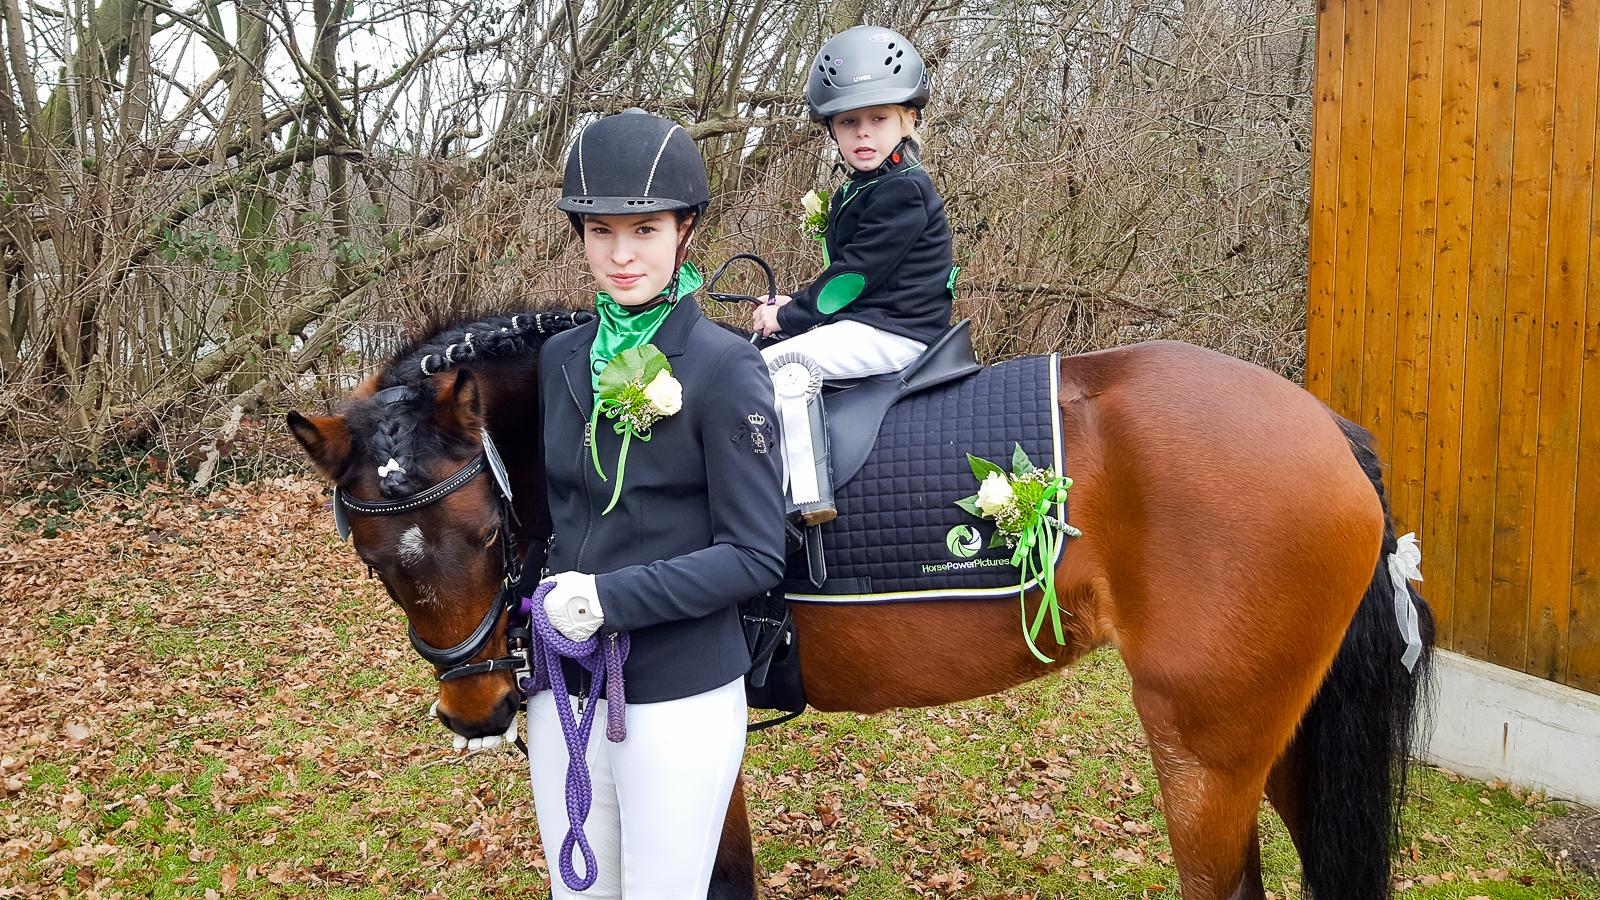 Anna Czerwinski - Team HorsePowerPictures